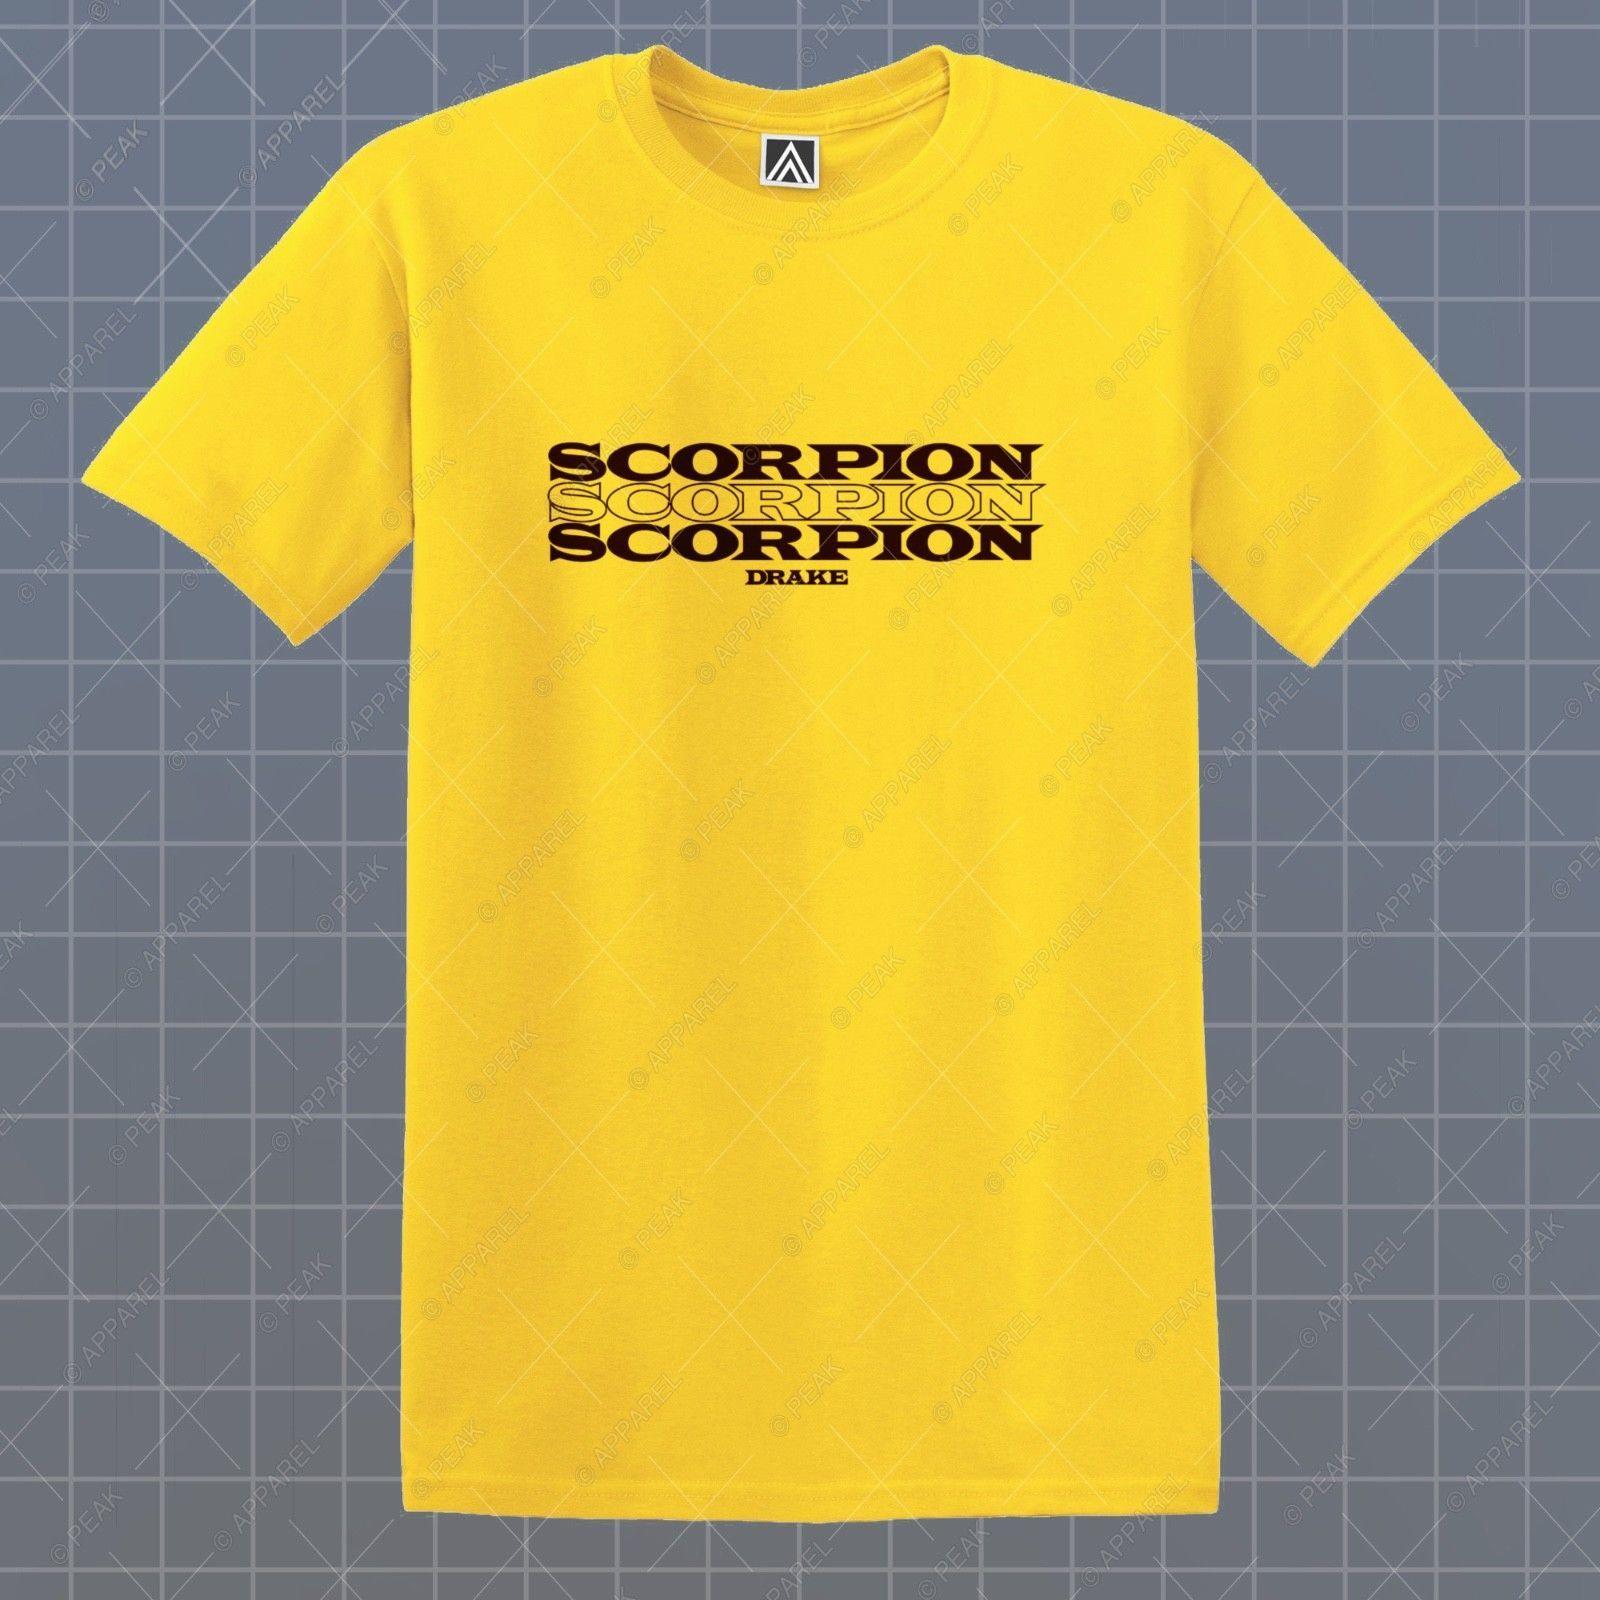 aa23f5767c3ed2 Details Zu Scorpion T Shirt Keke Ovo Drake Views Tee Woes God Plan Upset  Feelings Logo Top Funny Unisex Casual Gift Cool T Shirts For Men Cheap Tee  Shirts ...